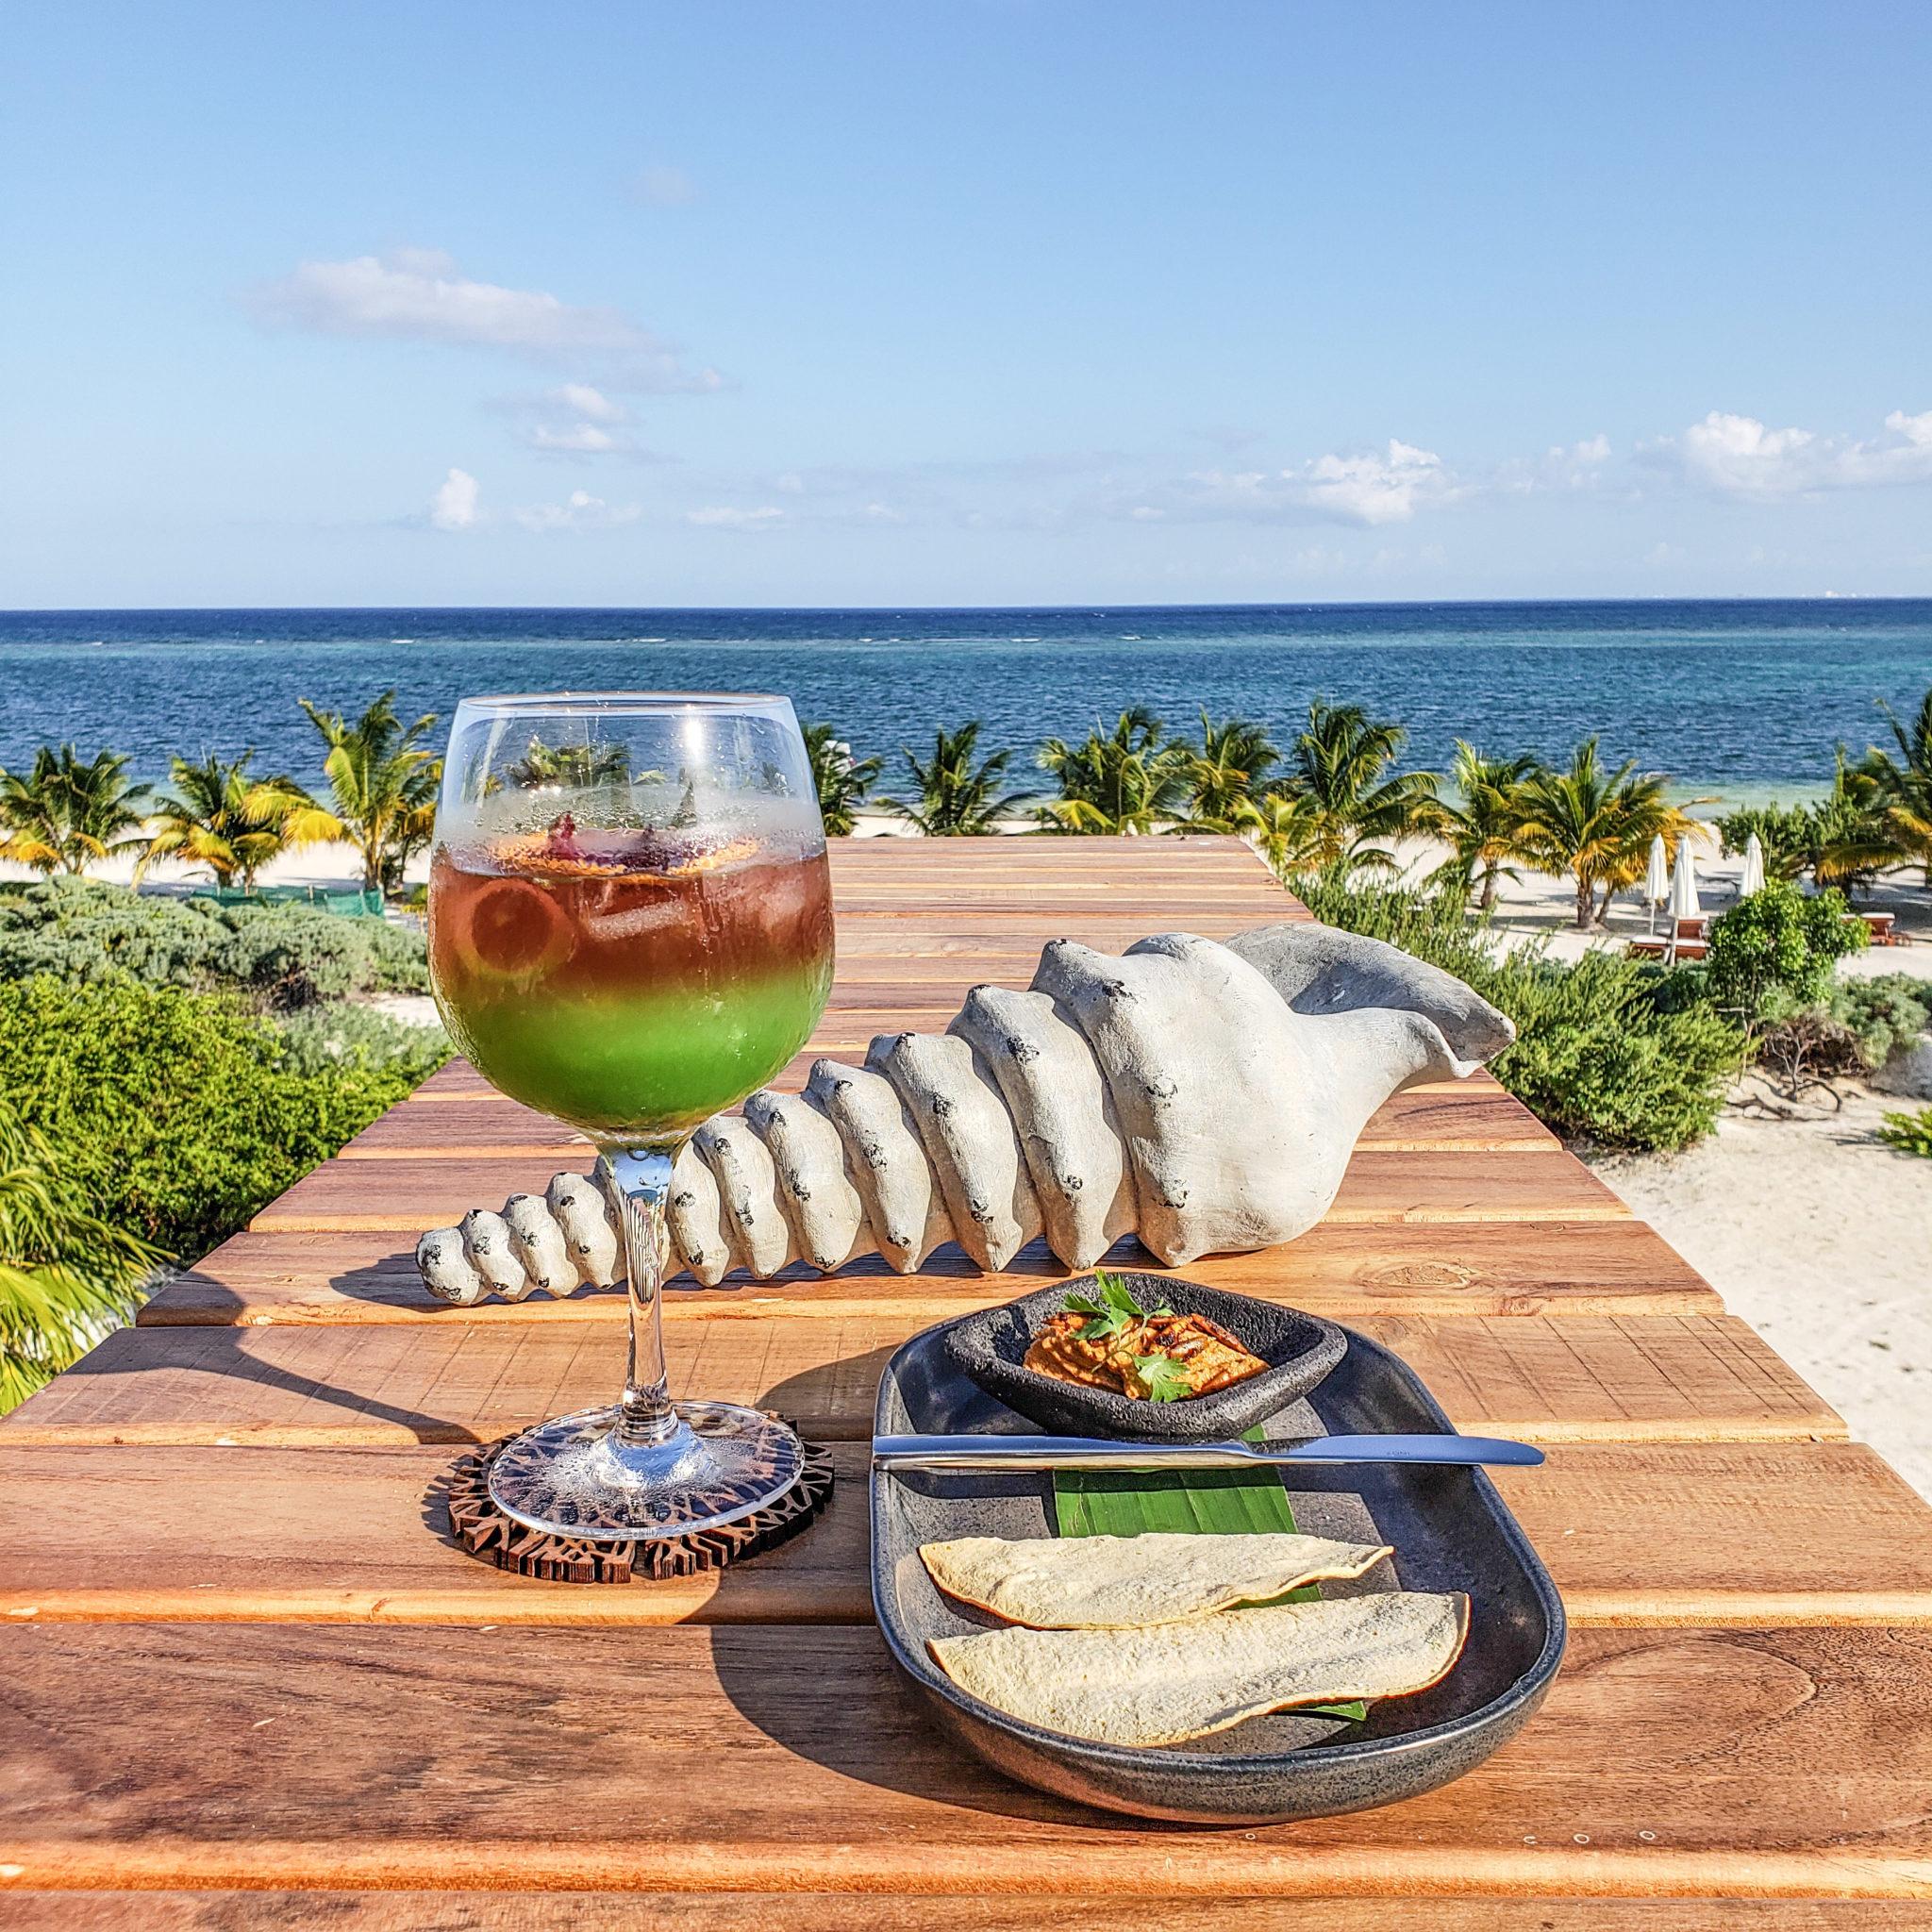 Chable Maroma Resort - Quintana Roo - Playa Del Carmen - Playa Maroma - Cocktail Class - Margarita